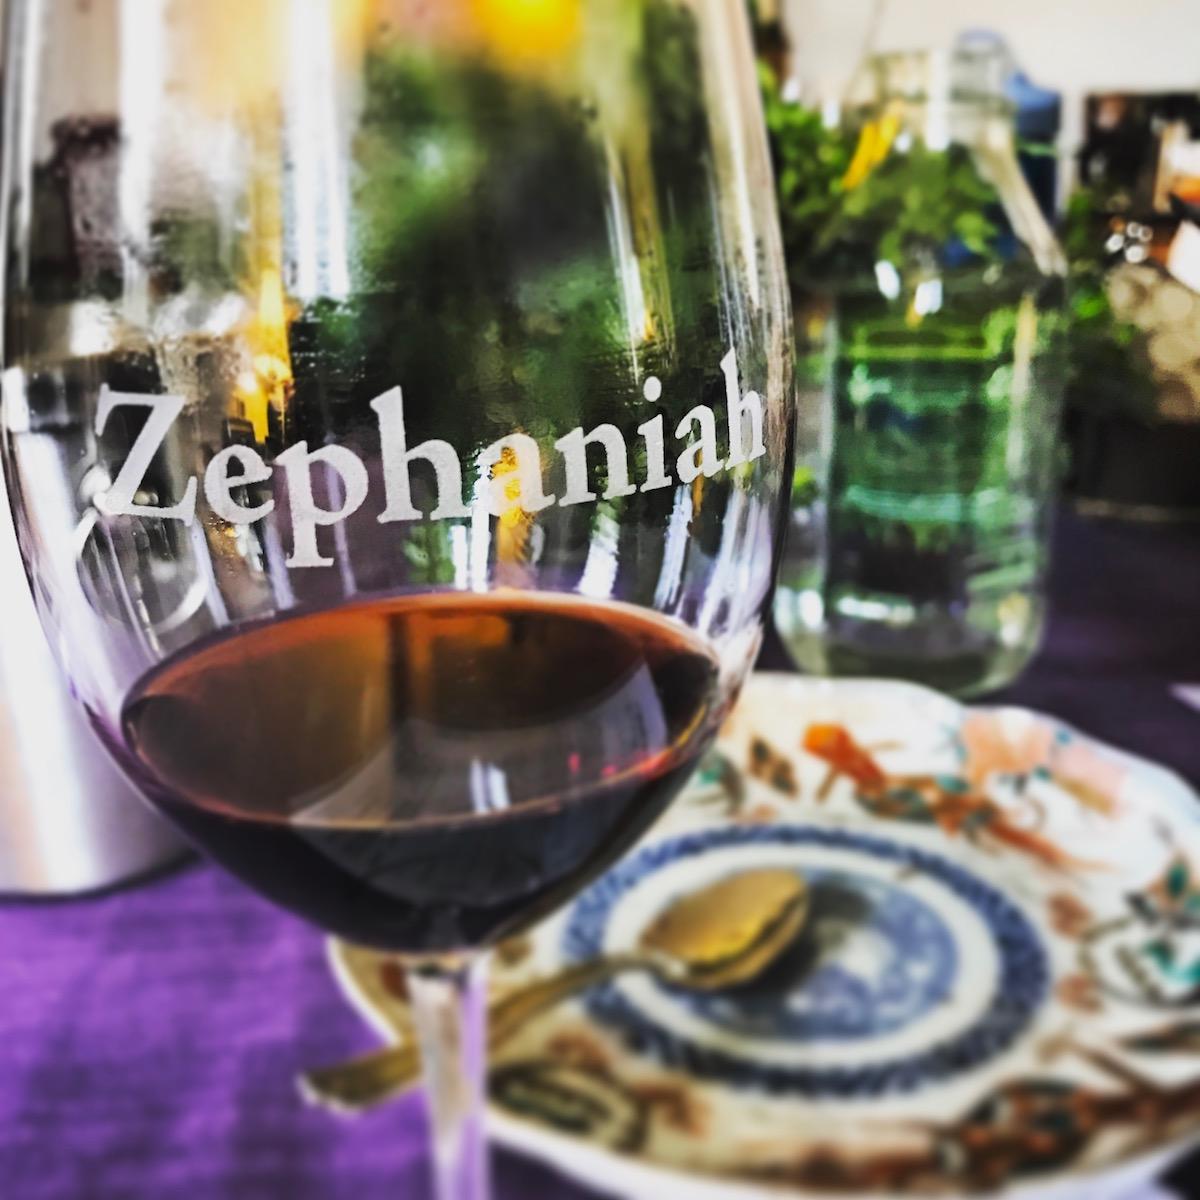 Zephaniah Farm Vineyard